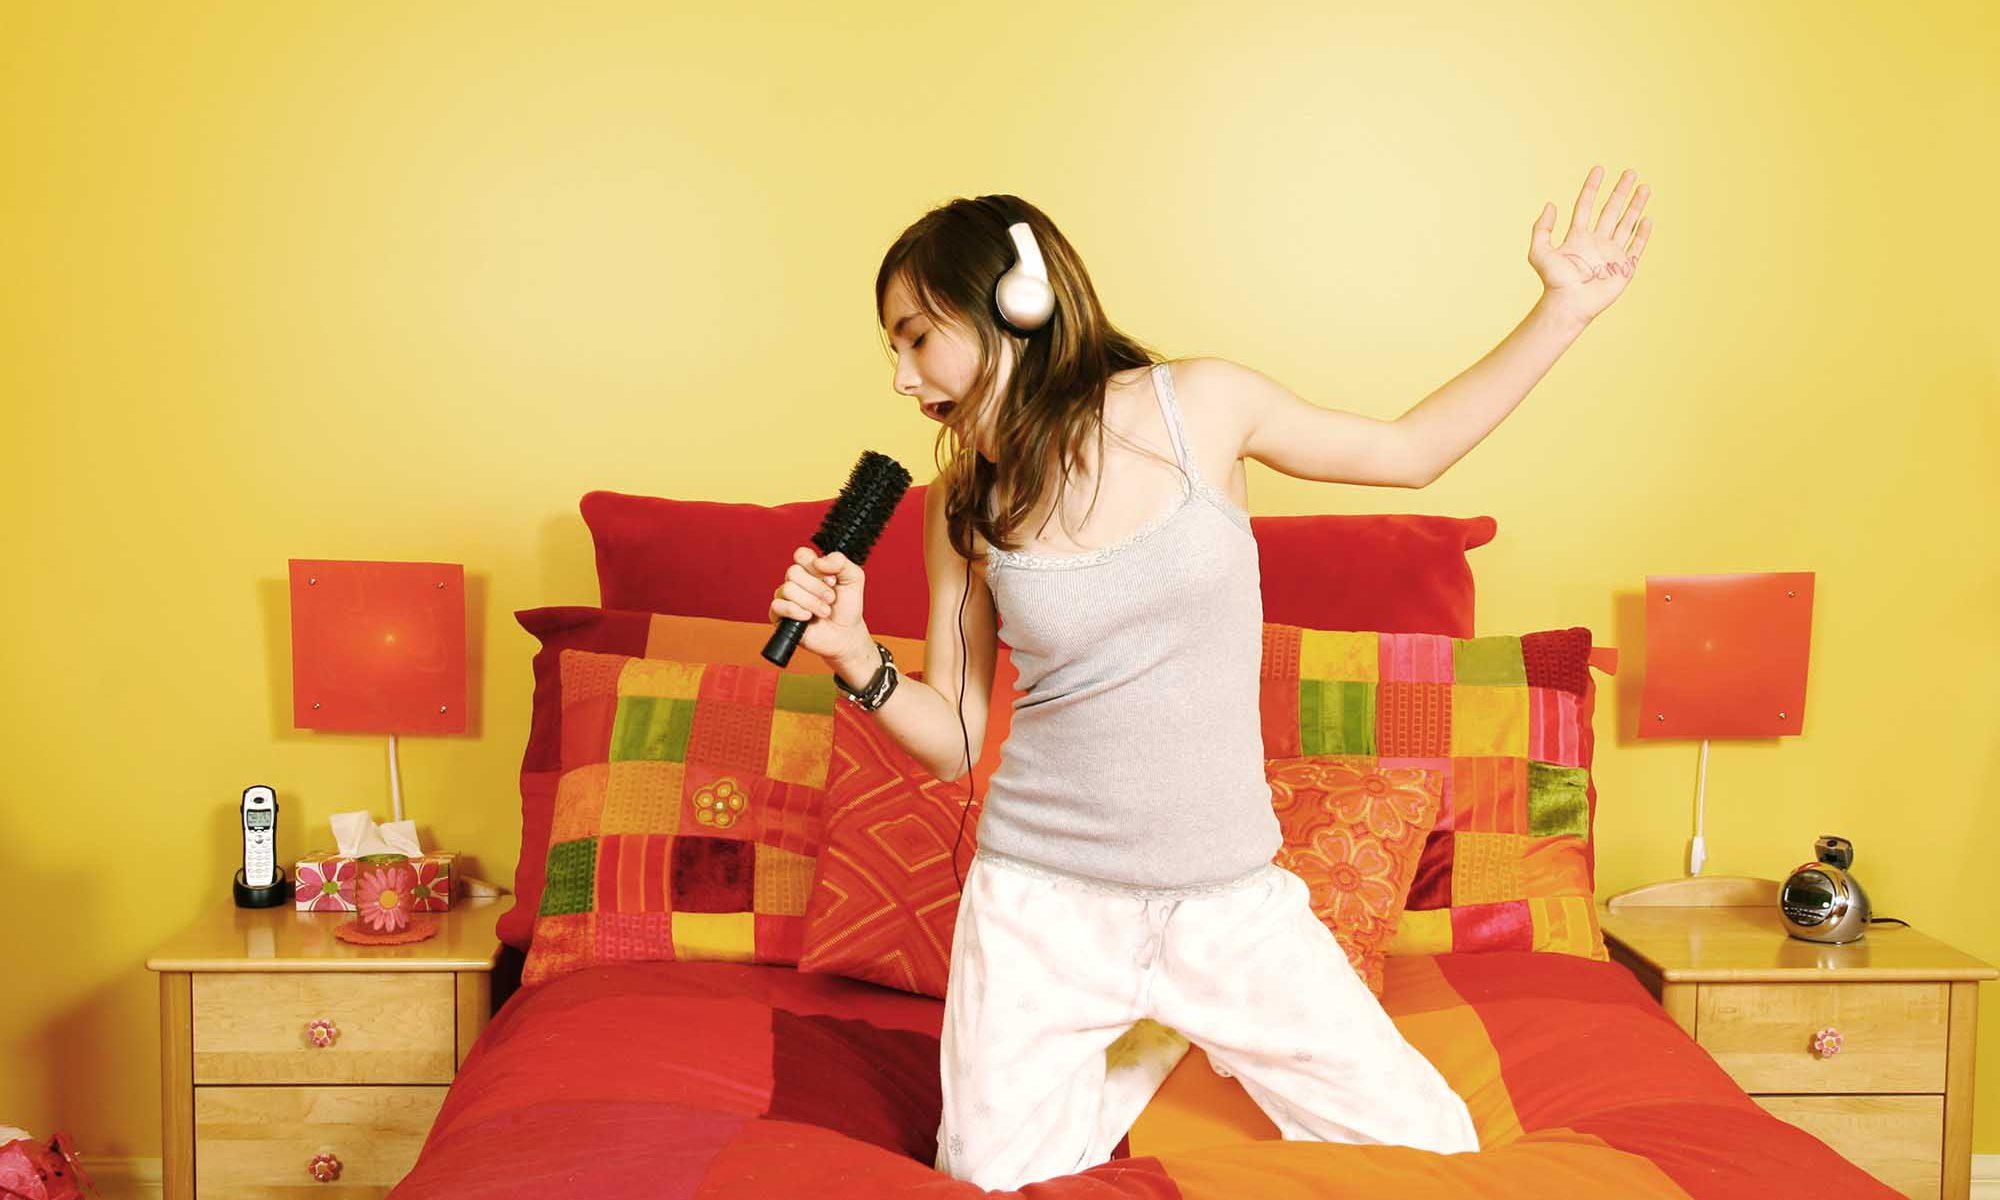 Aprender ingles cantando.